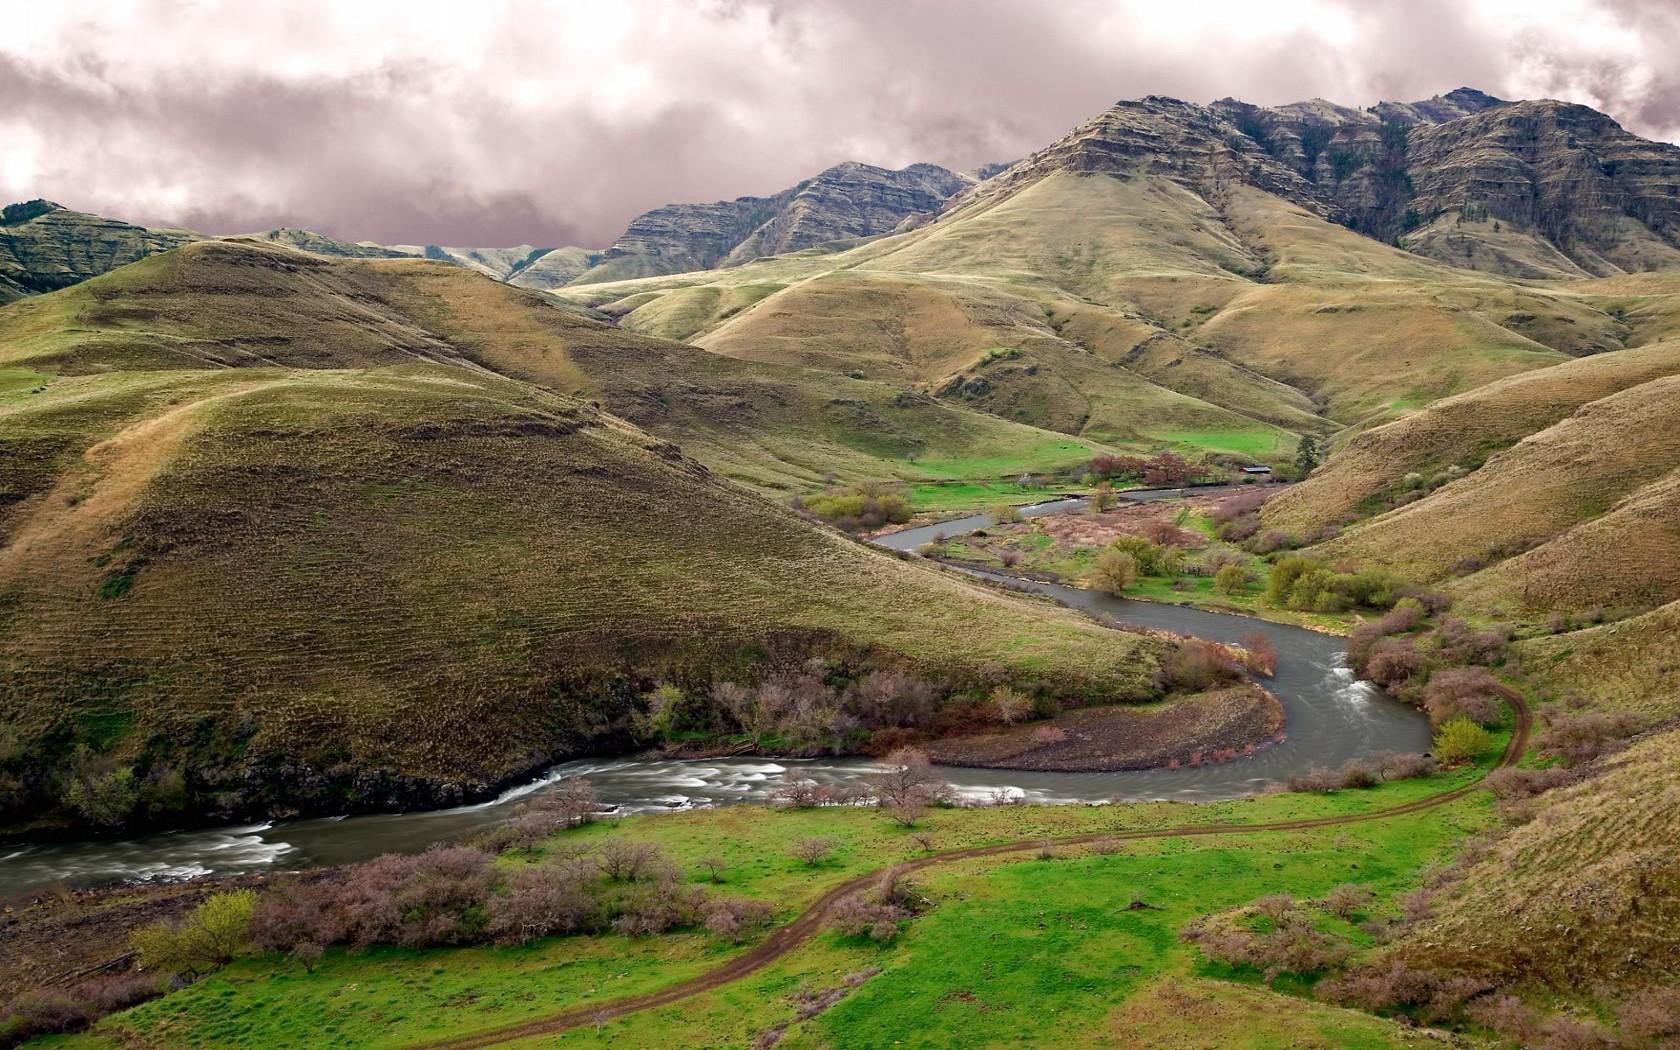 Азербайджан природа фотографии 6